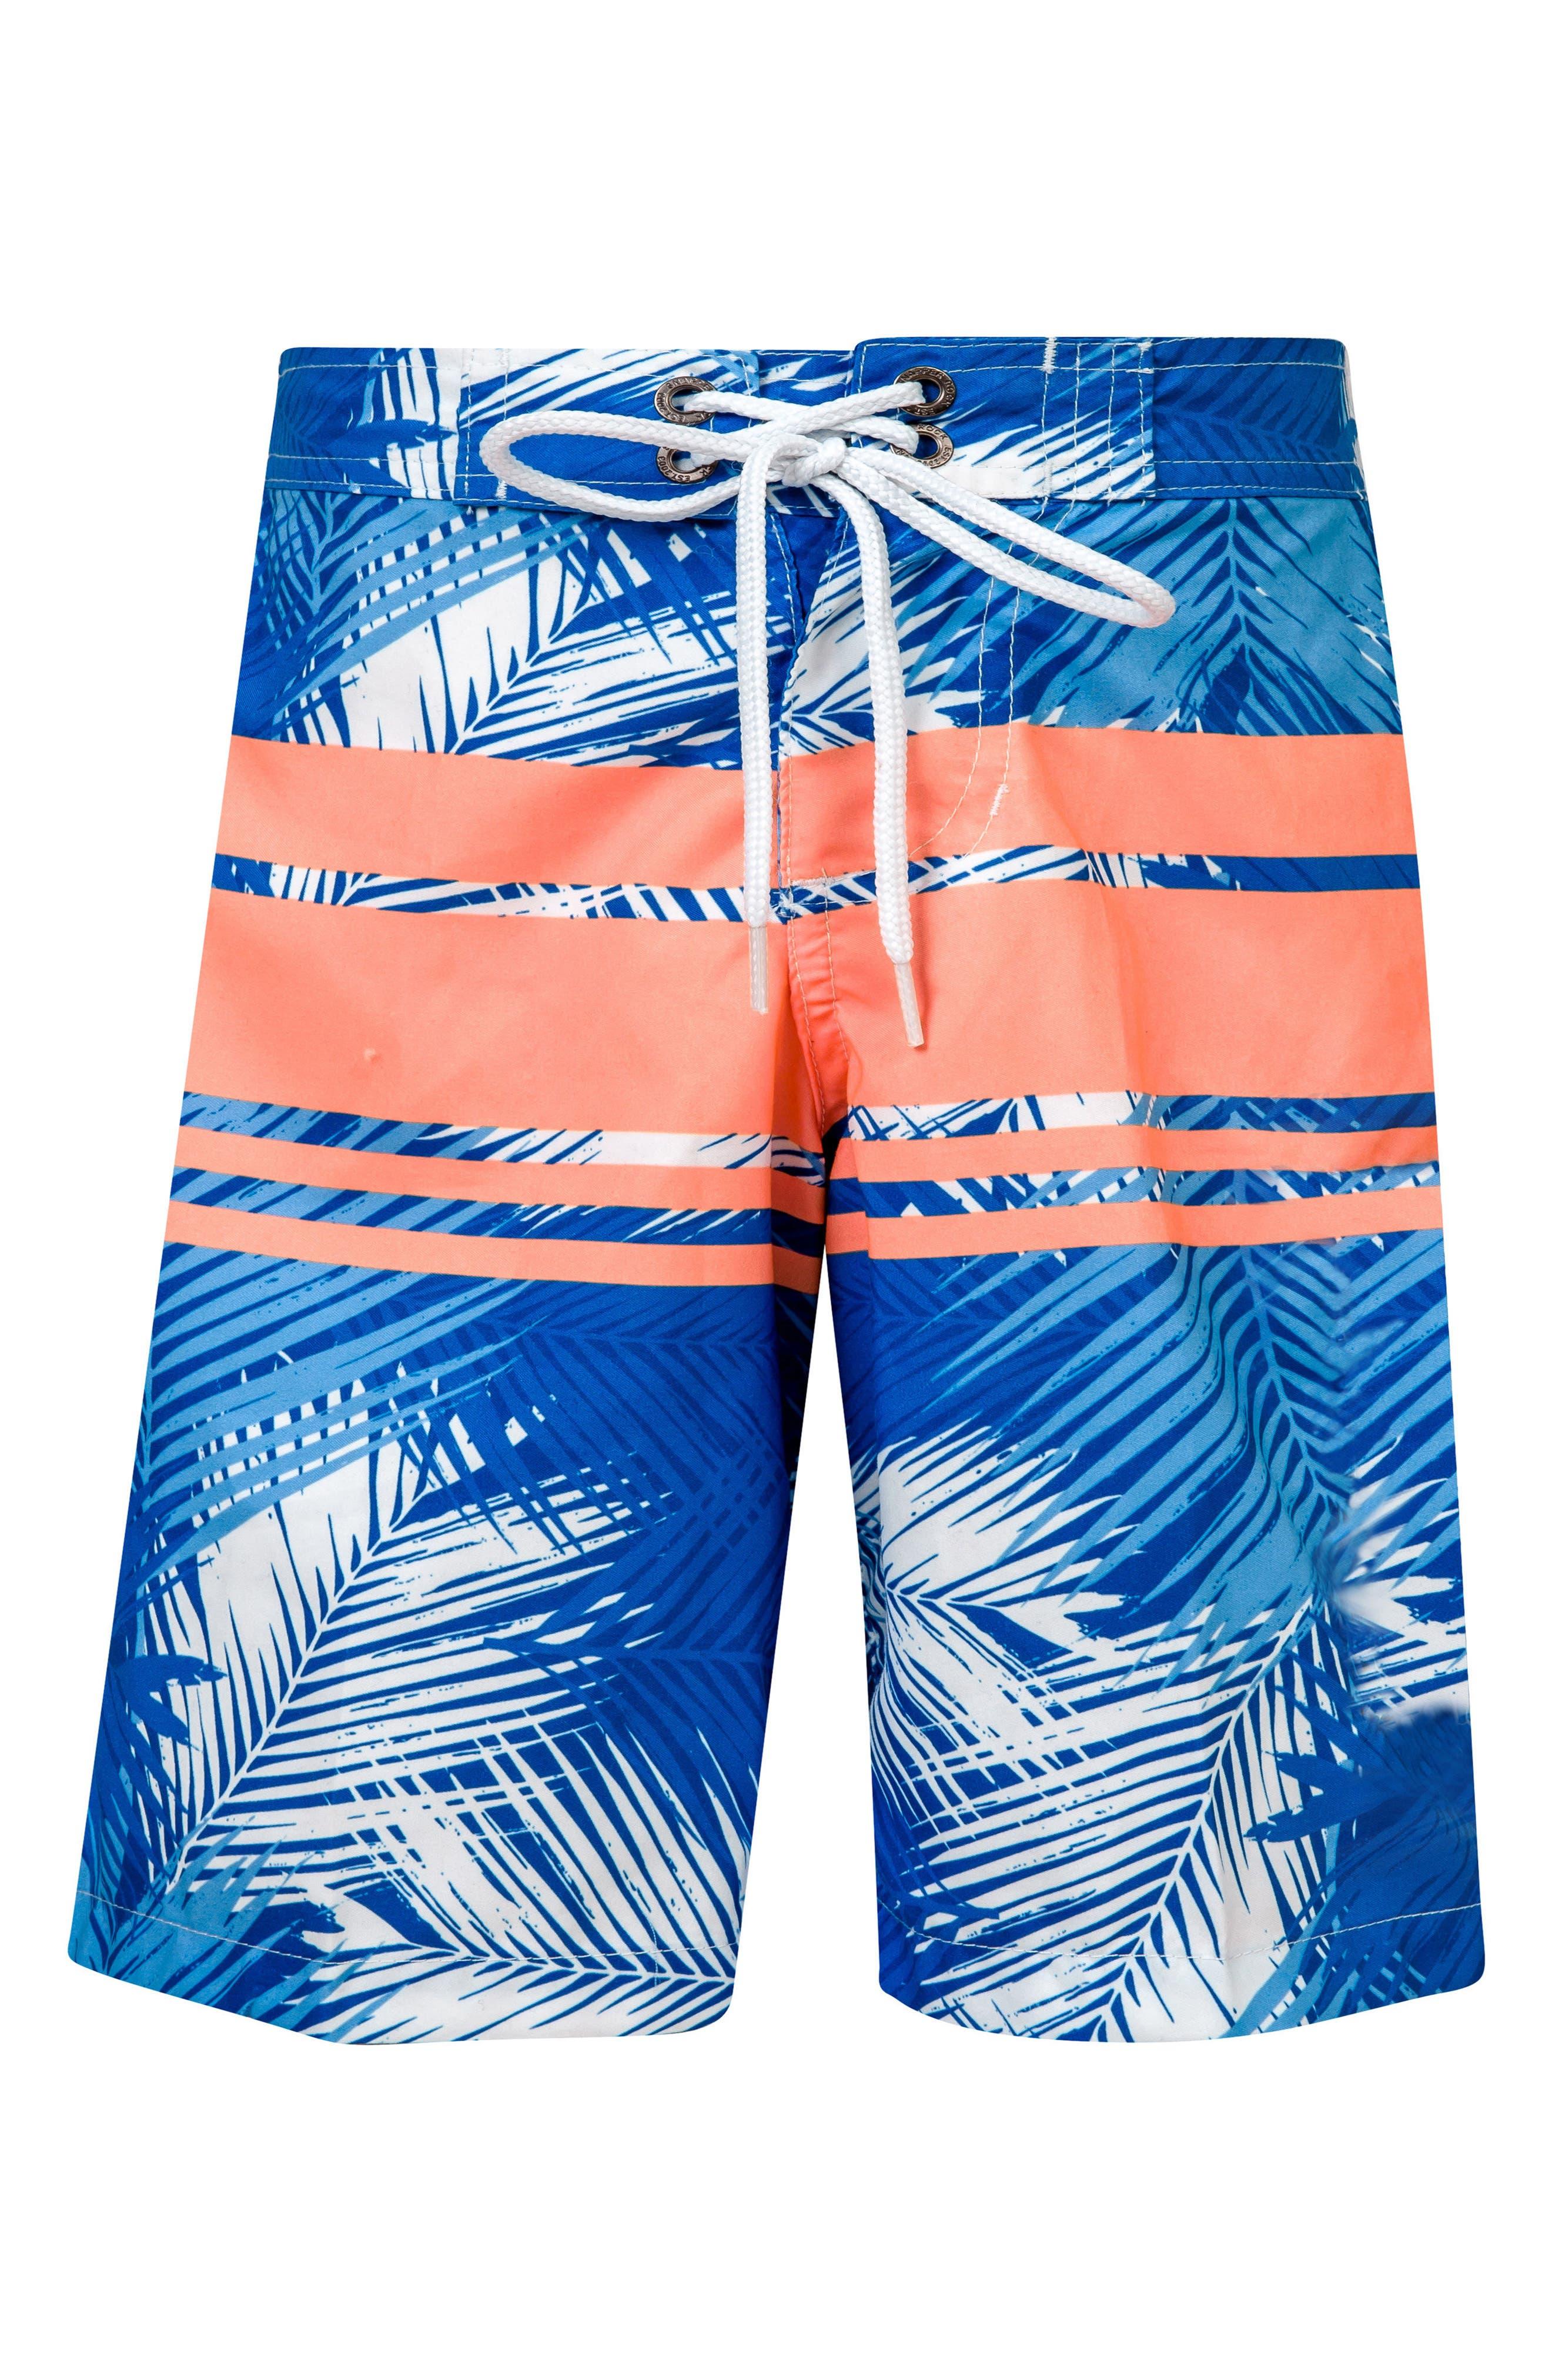 Tropical Neon Stripe Board Shorts,                             Main thumbnail 1, color,                             Royal/ Neon Coral/ White